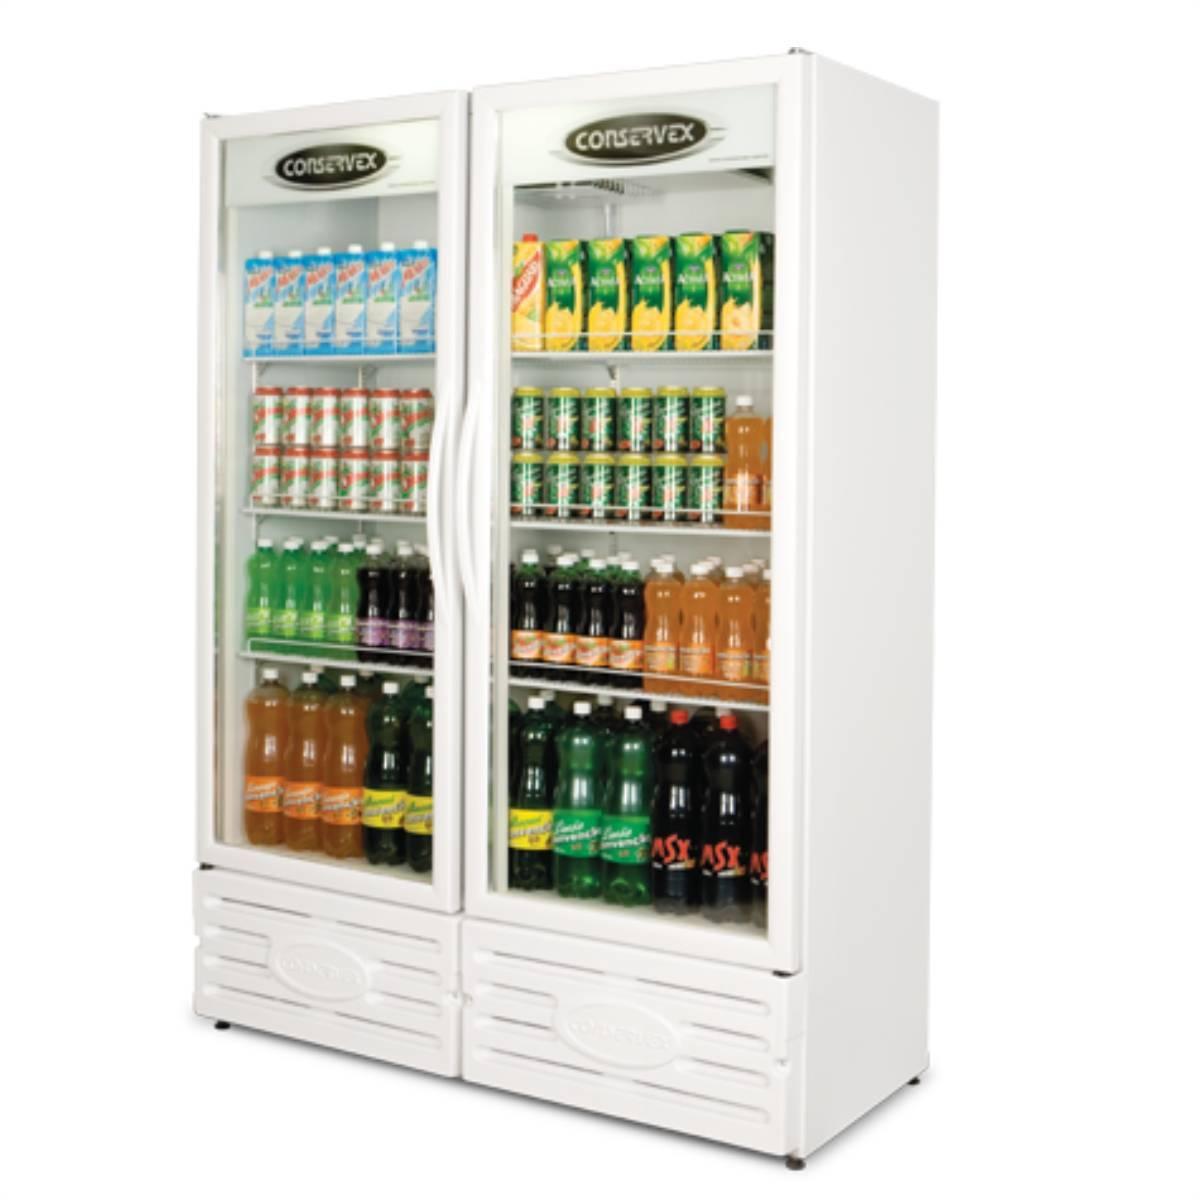 Expositor Refrigerado Vertical Visa Cooler 850l Conservex